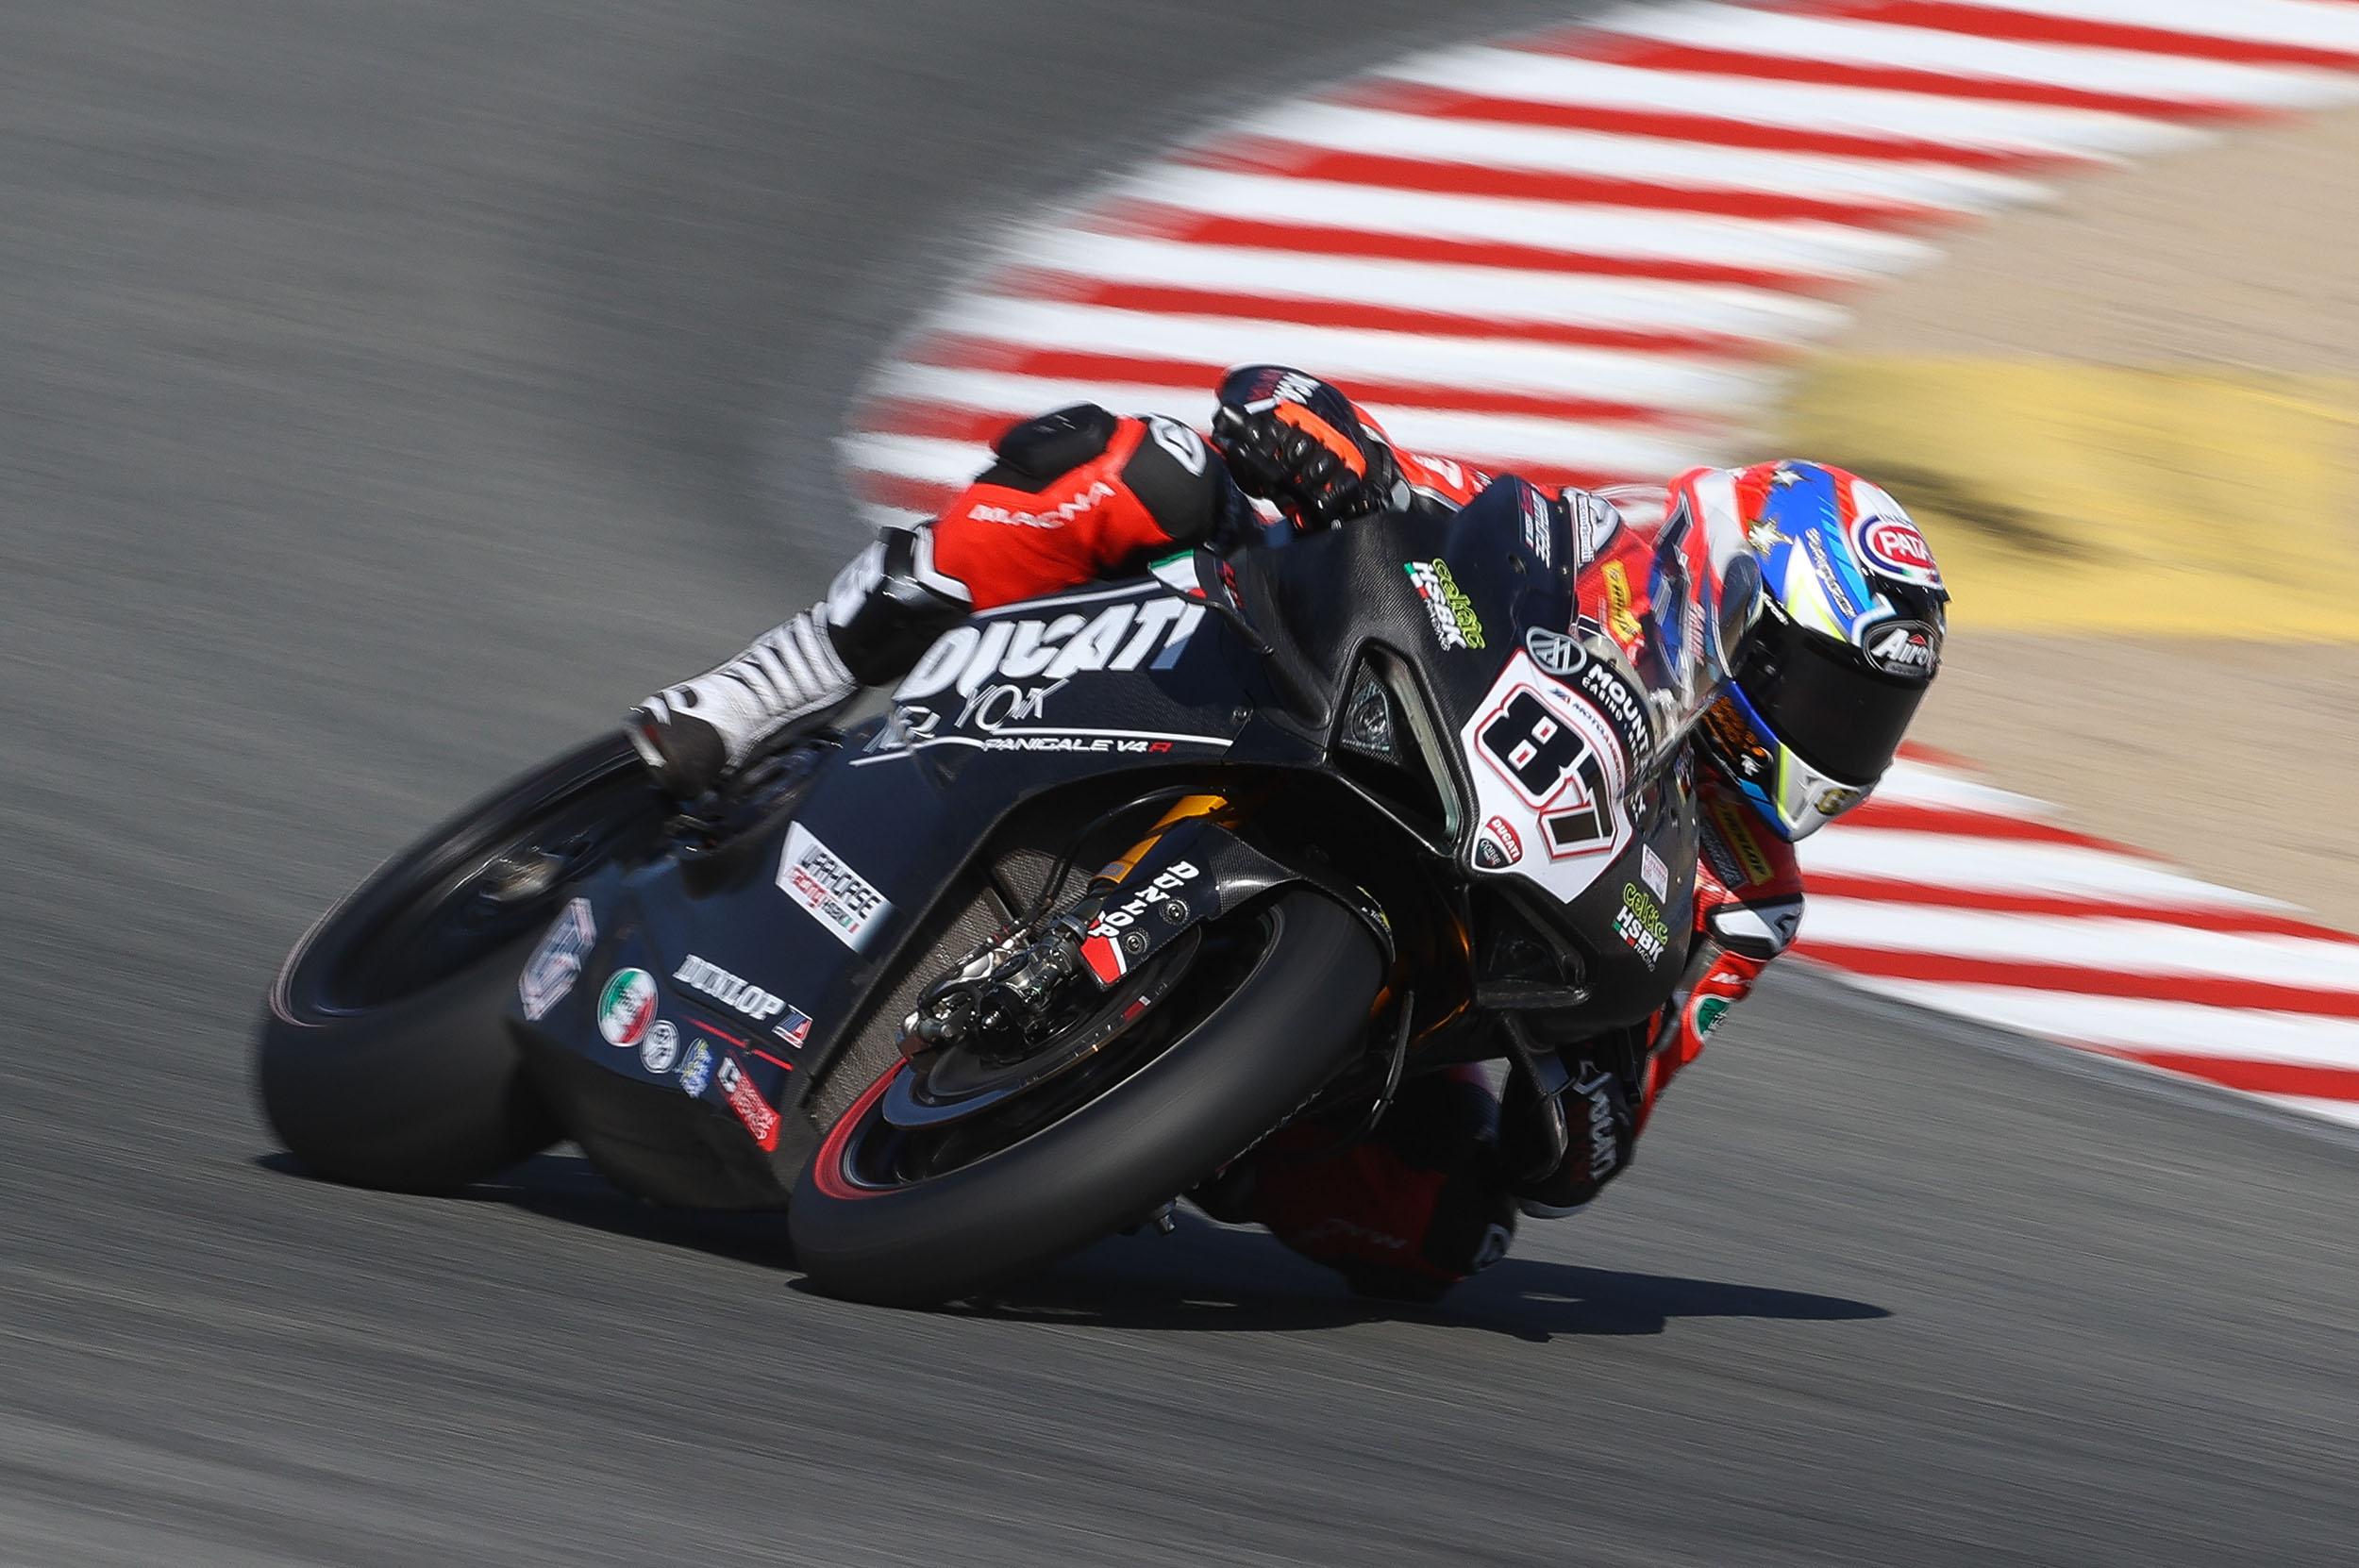 201024 MotoAmerica - Lorenzo Zanetti - #87 – Laguna Seca